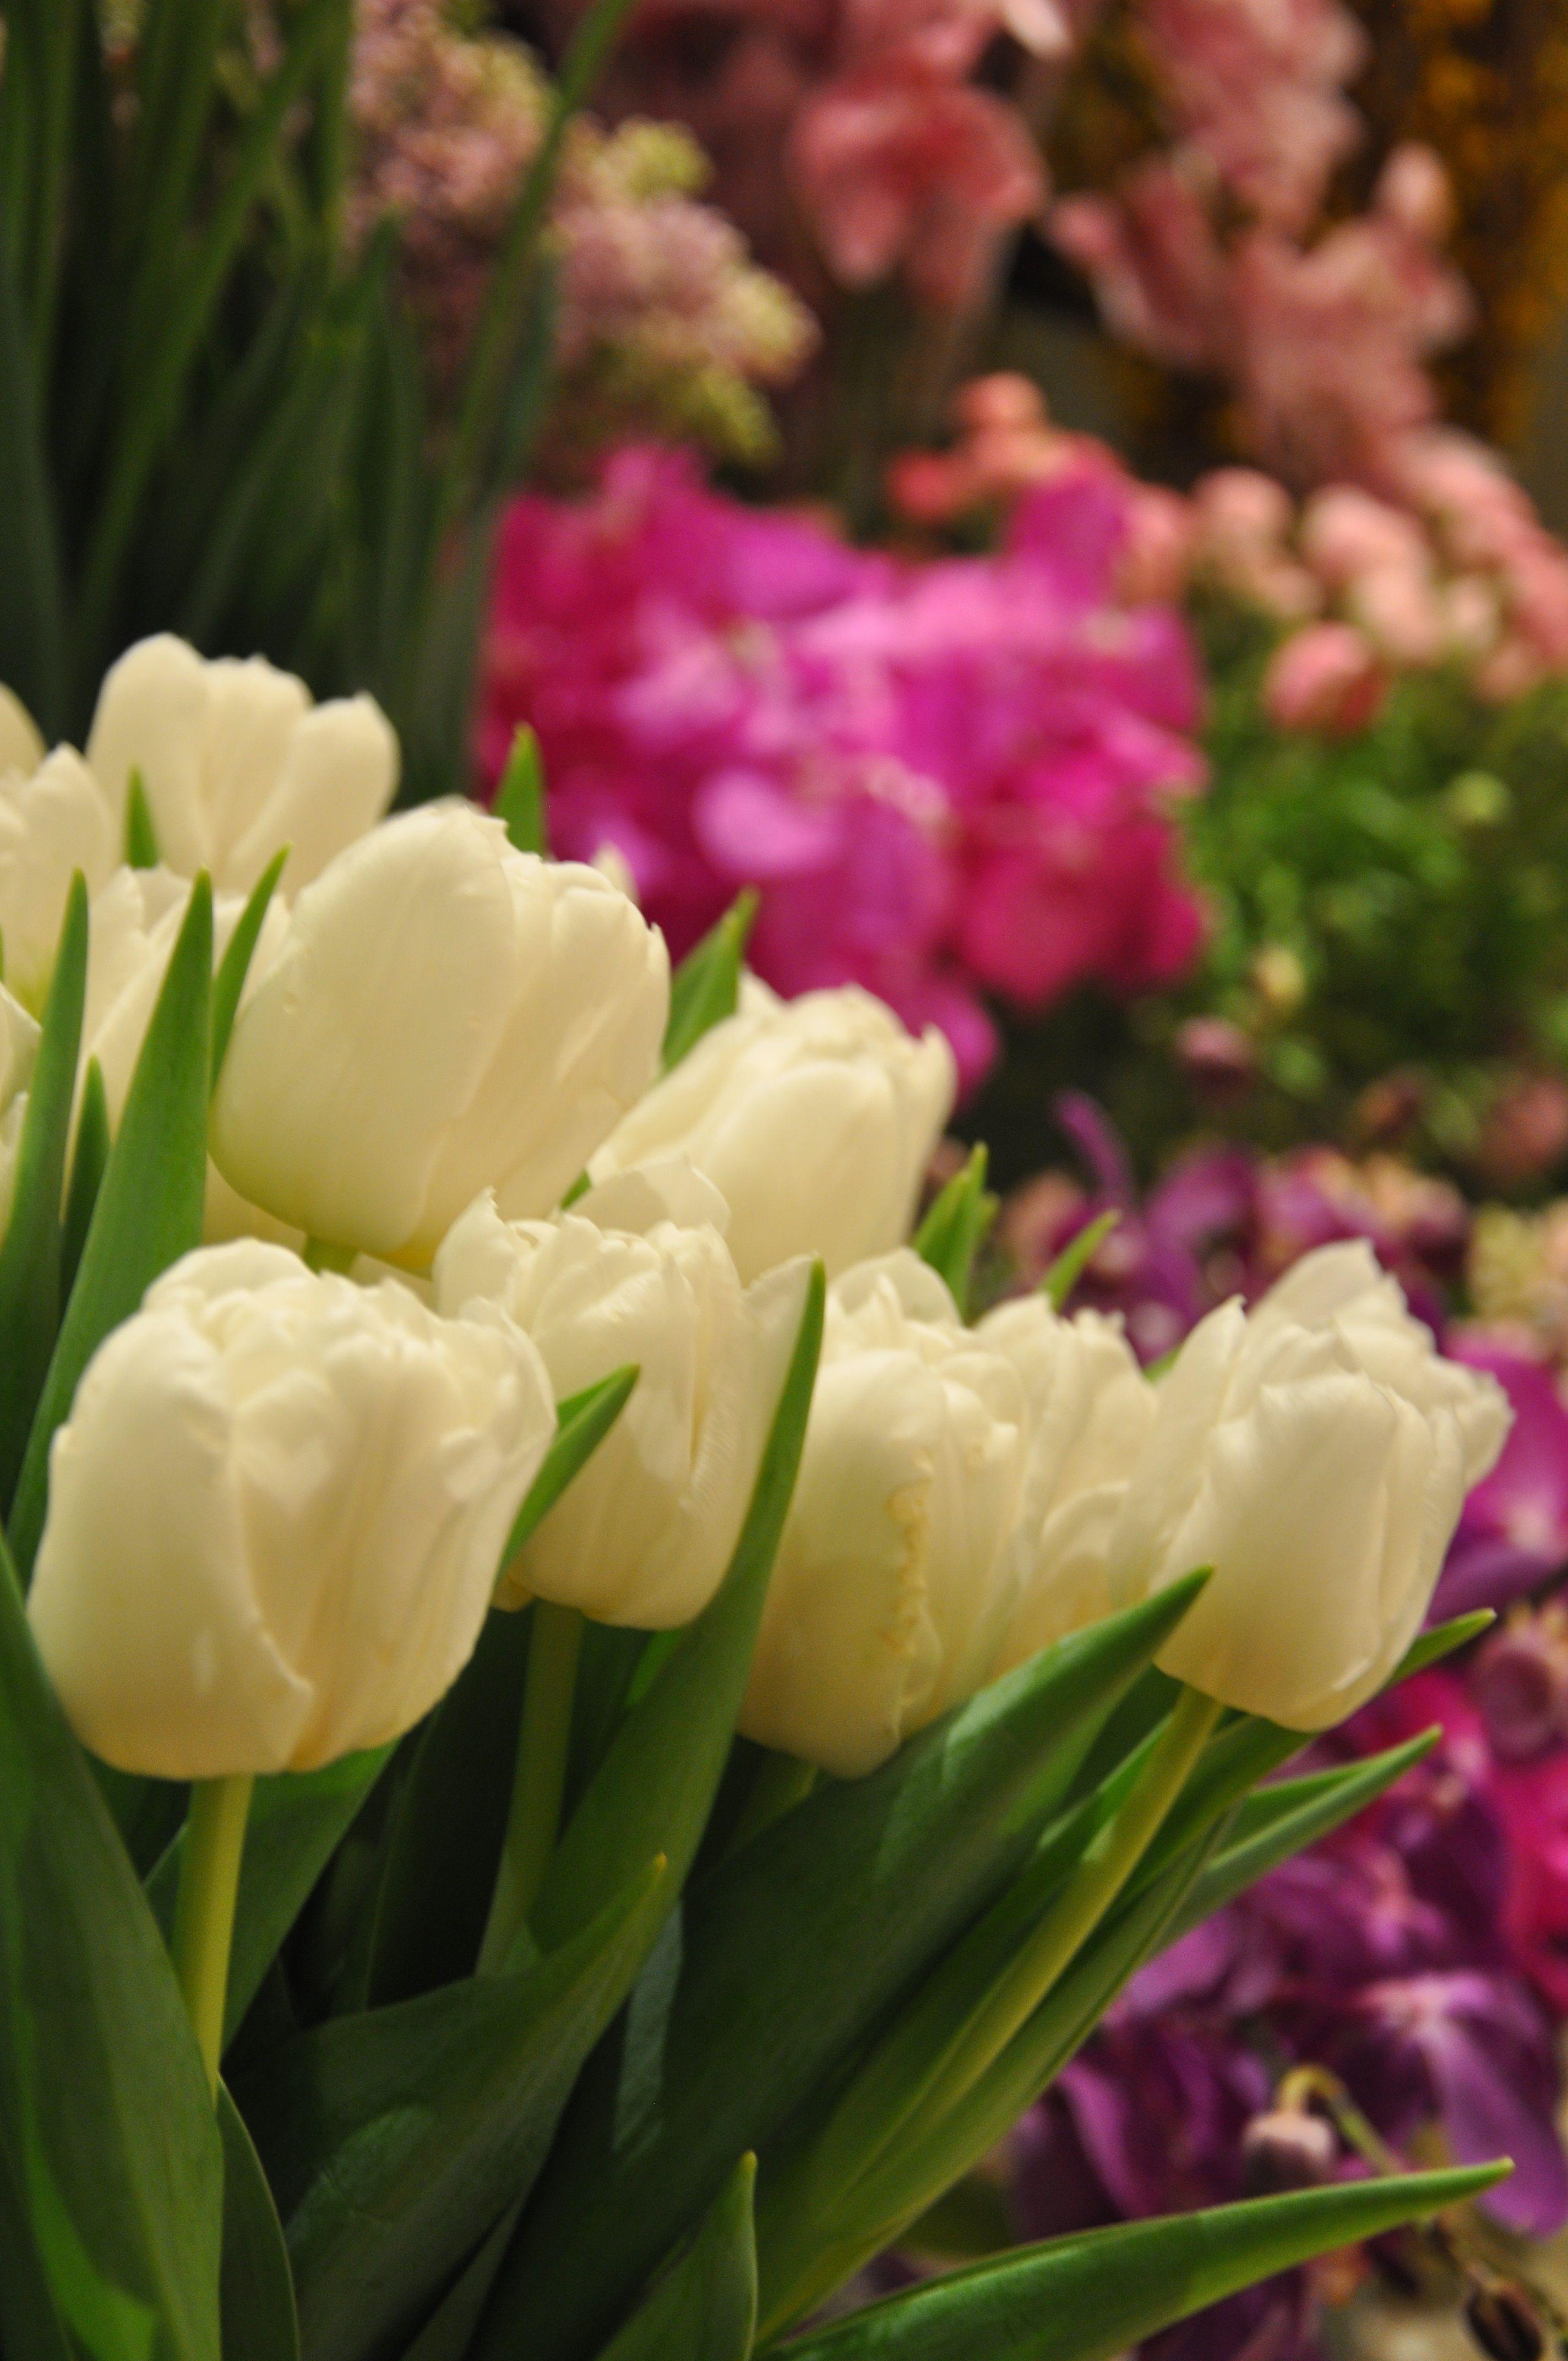 Beautiful white tulips at Corinthia Londons in-house